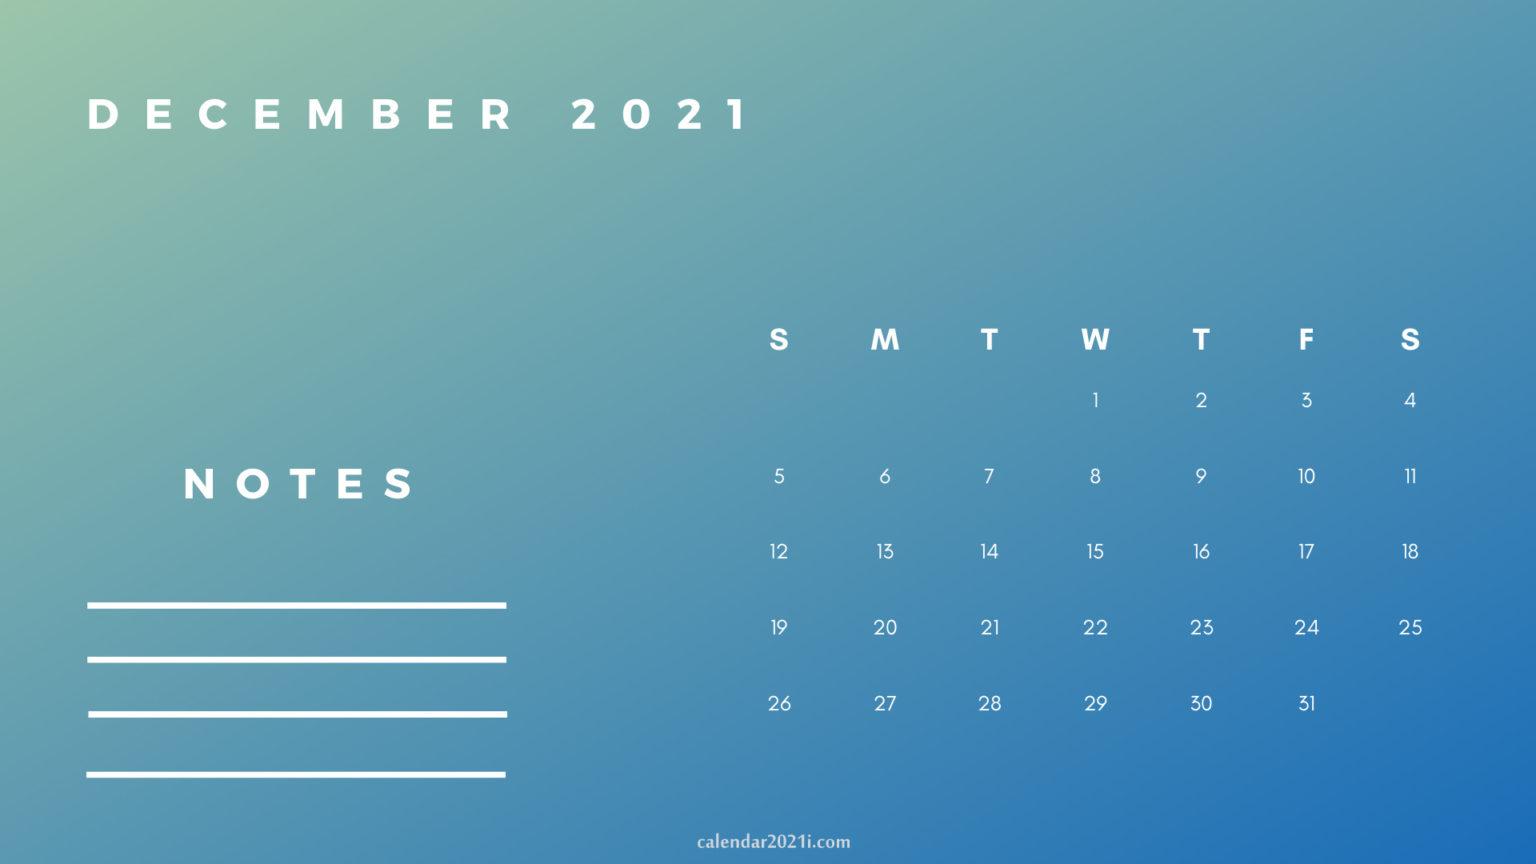 December Printable 2021 Planner CalendarDecember Printable 2021 Planner Calendar